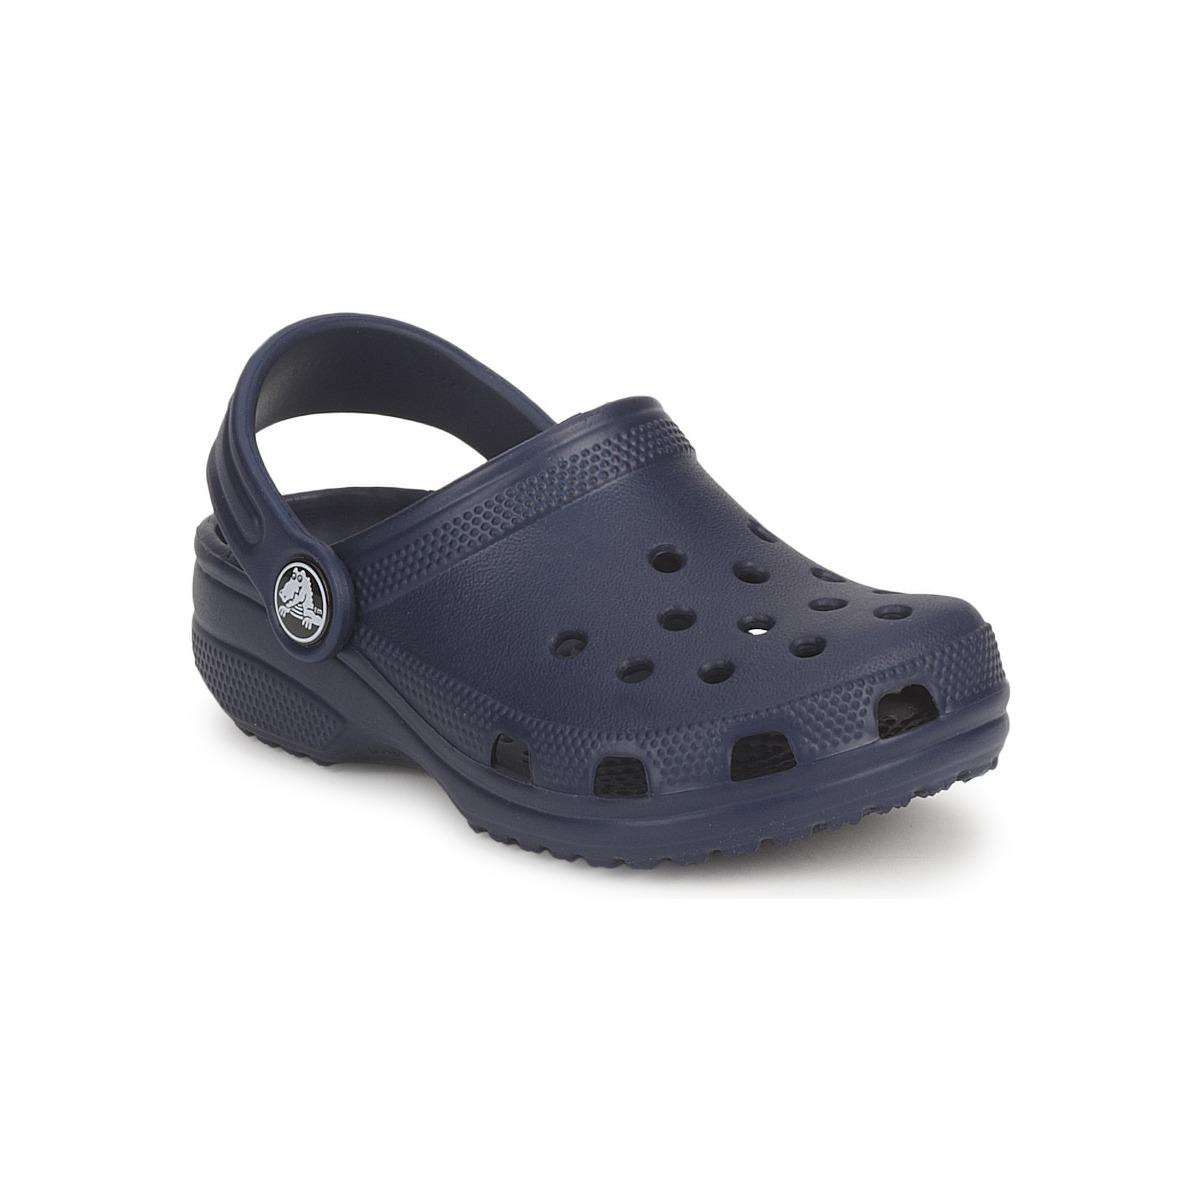 Clogs Crocs CLASSIC KIDS NAVY